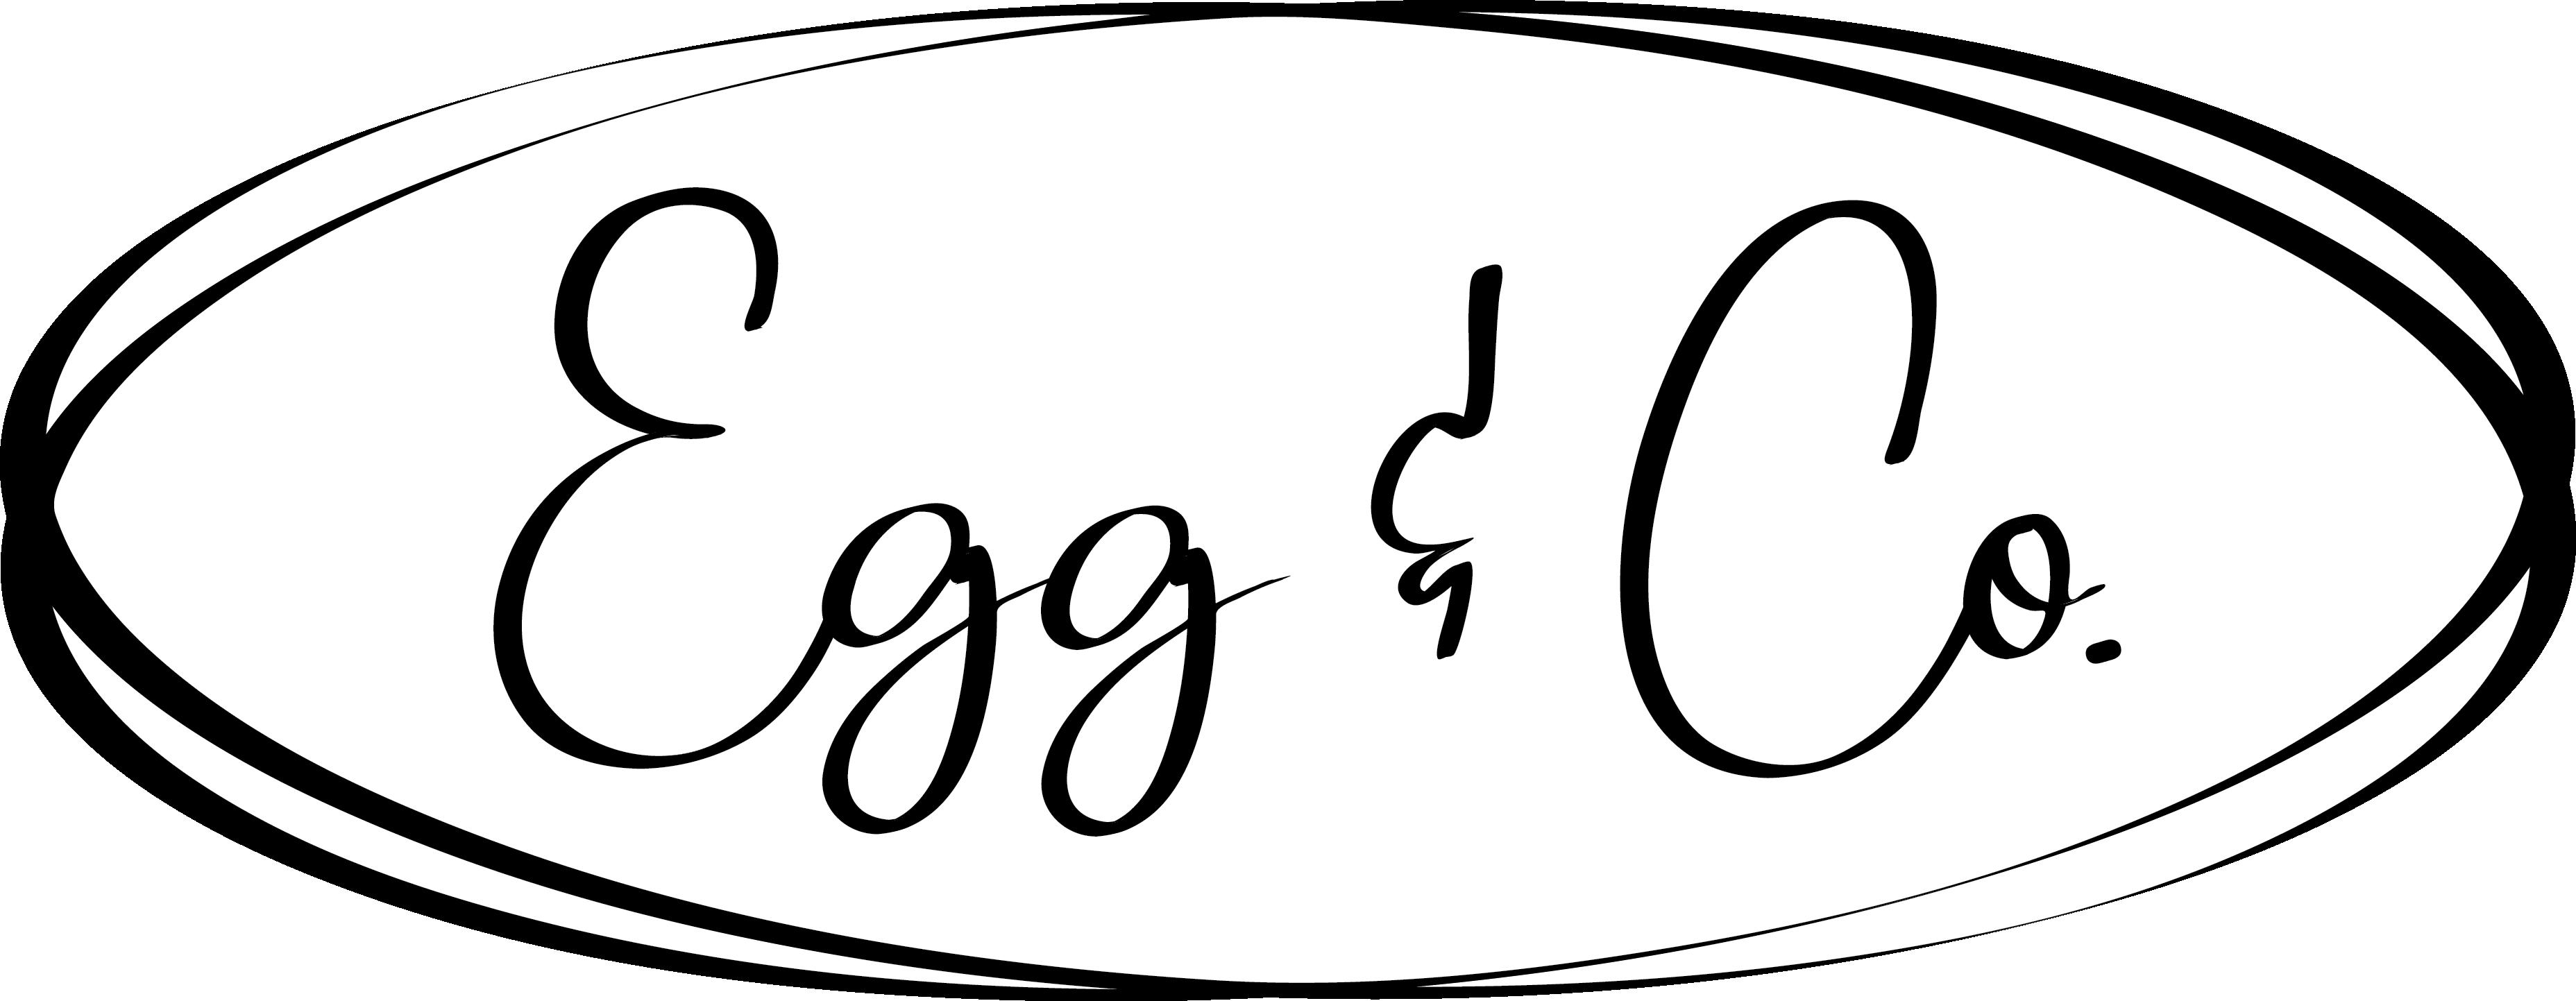 eggco_logo_white-copy